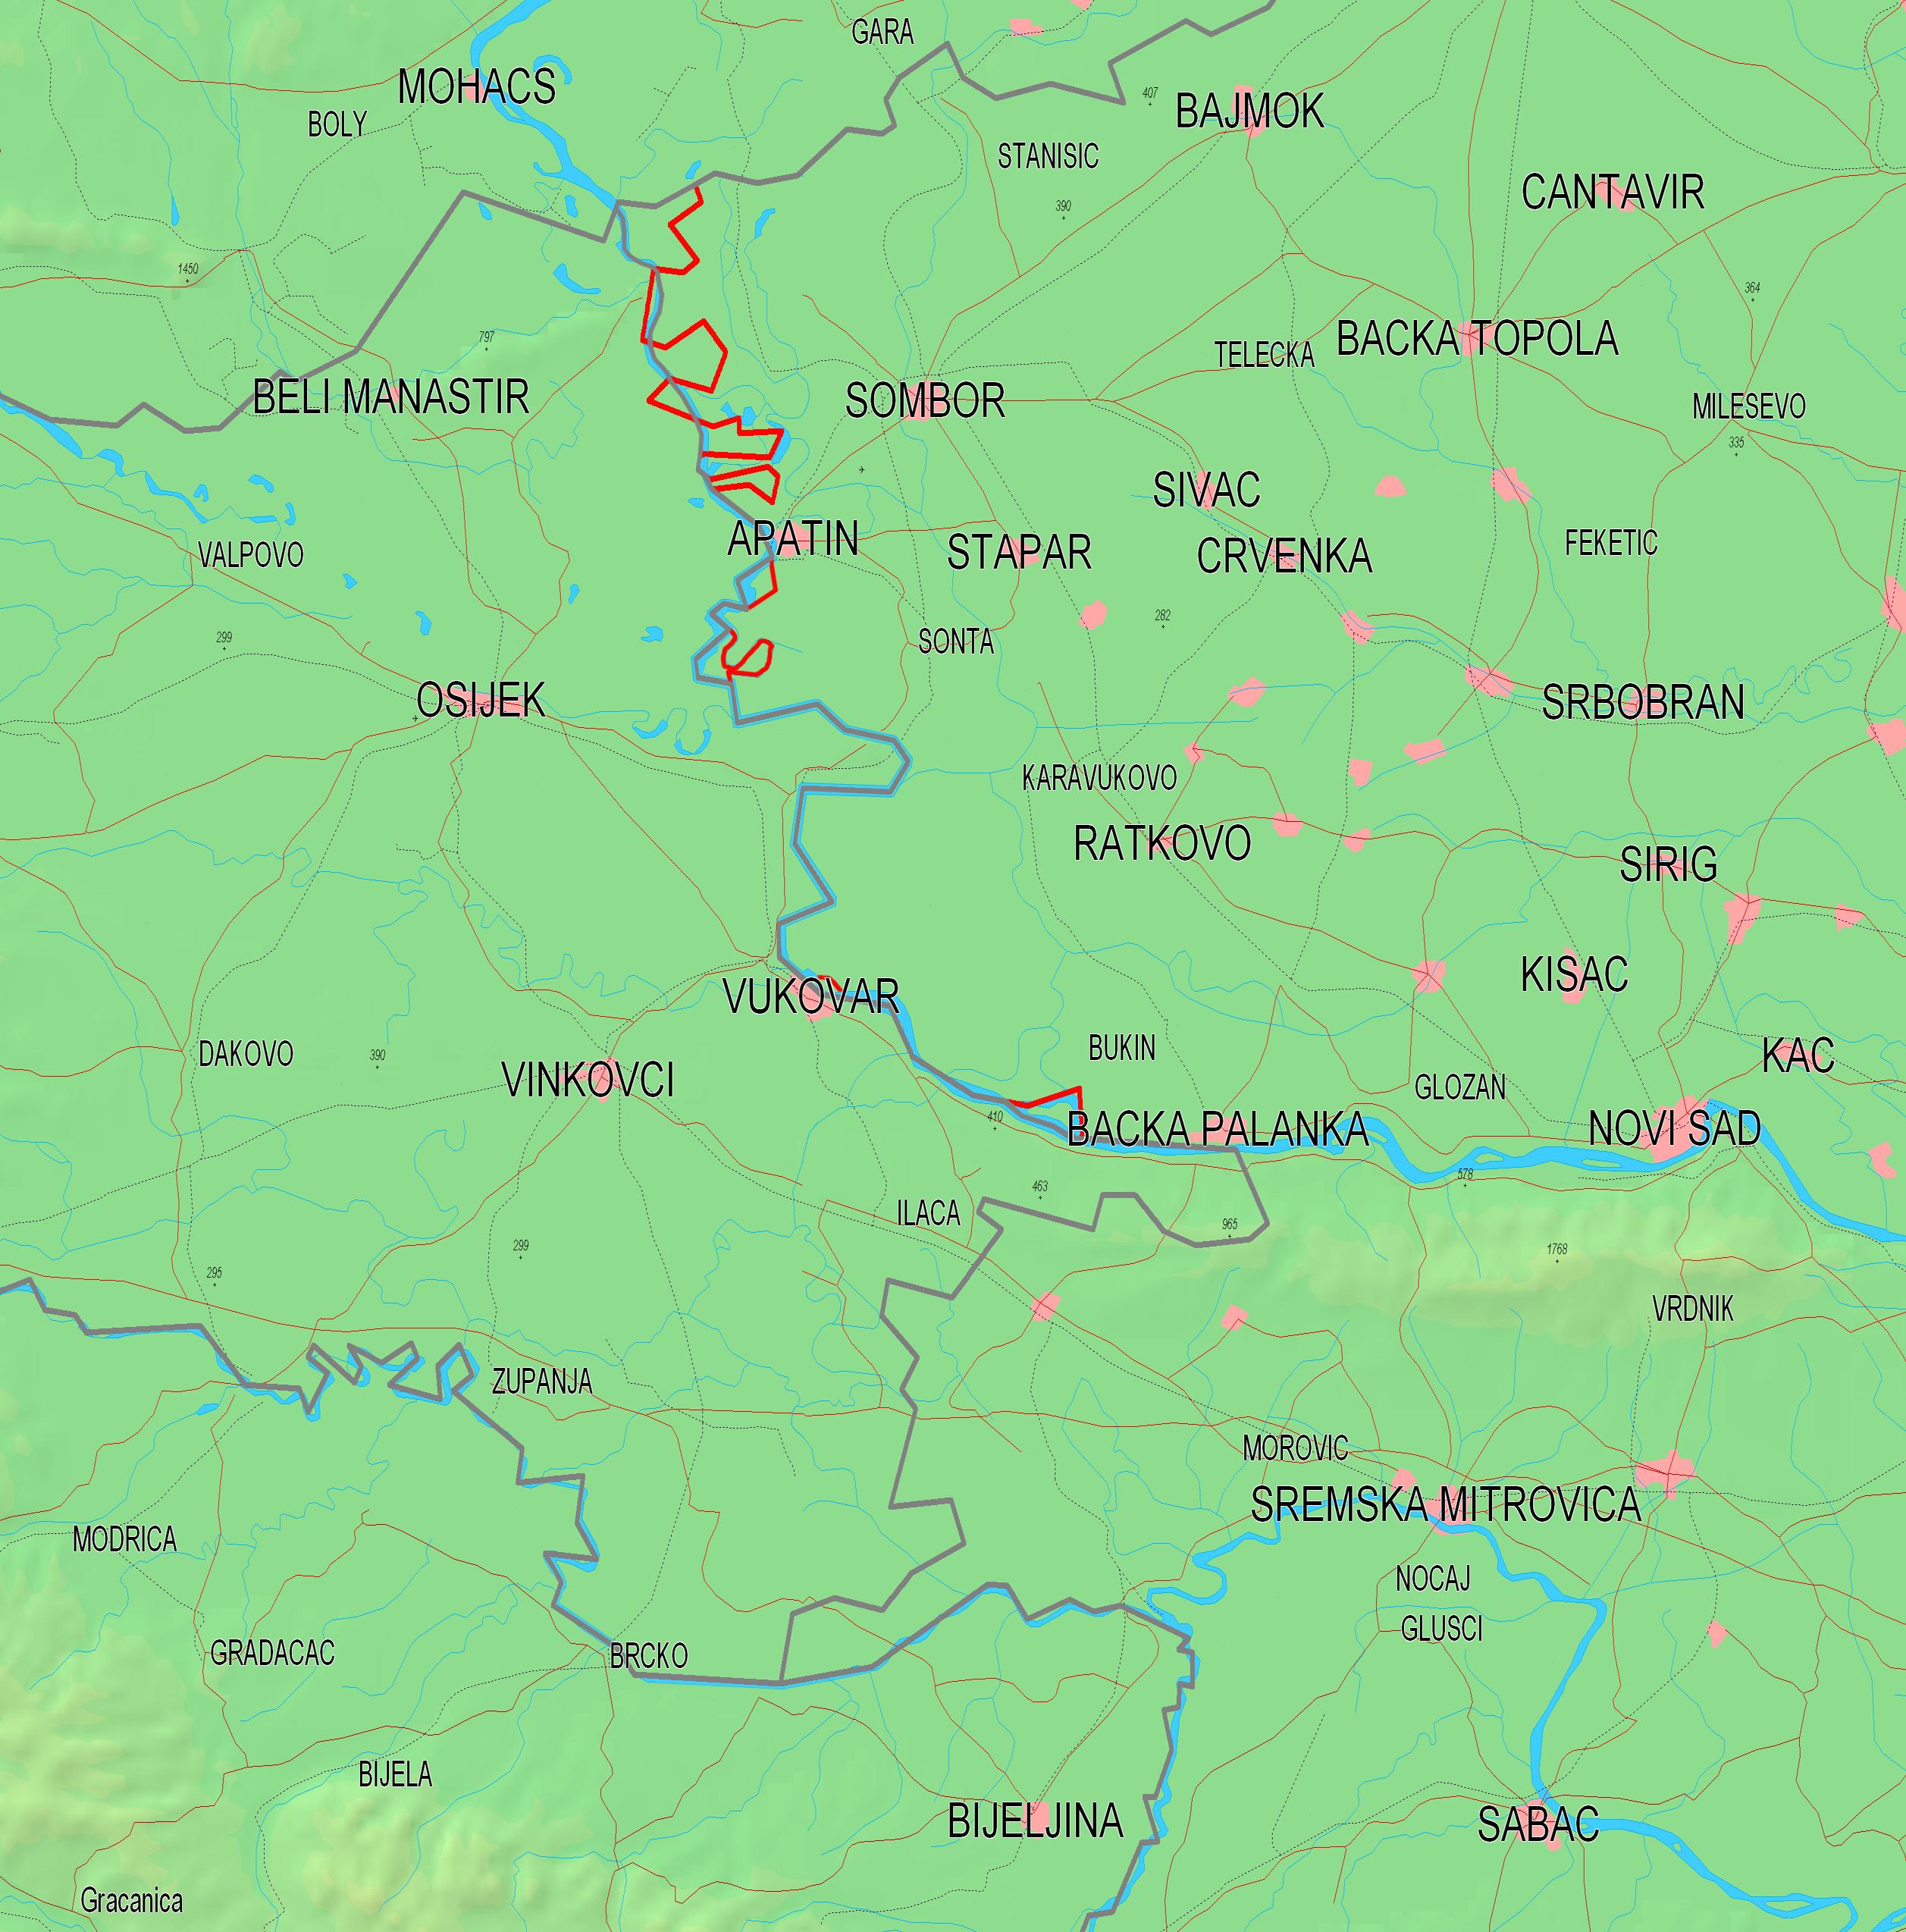 Carte Croatie Ilok.Frontiere Entre La Croatie Et La Serbie Wikipedia